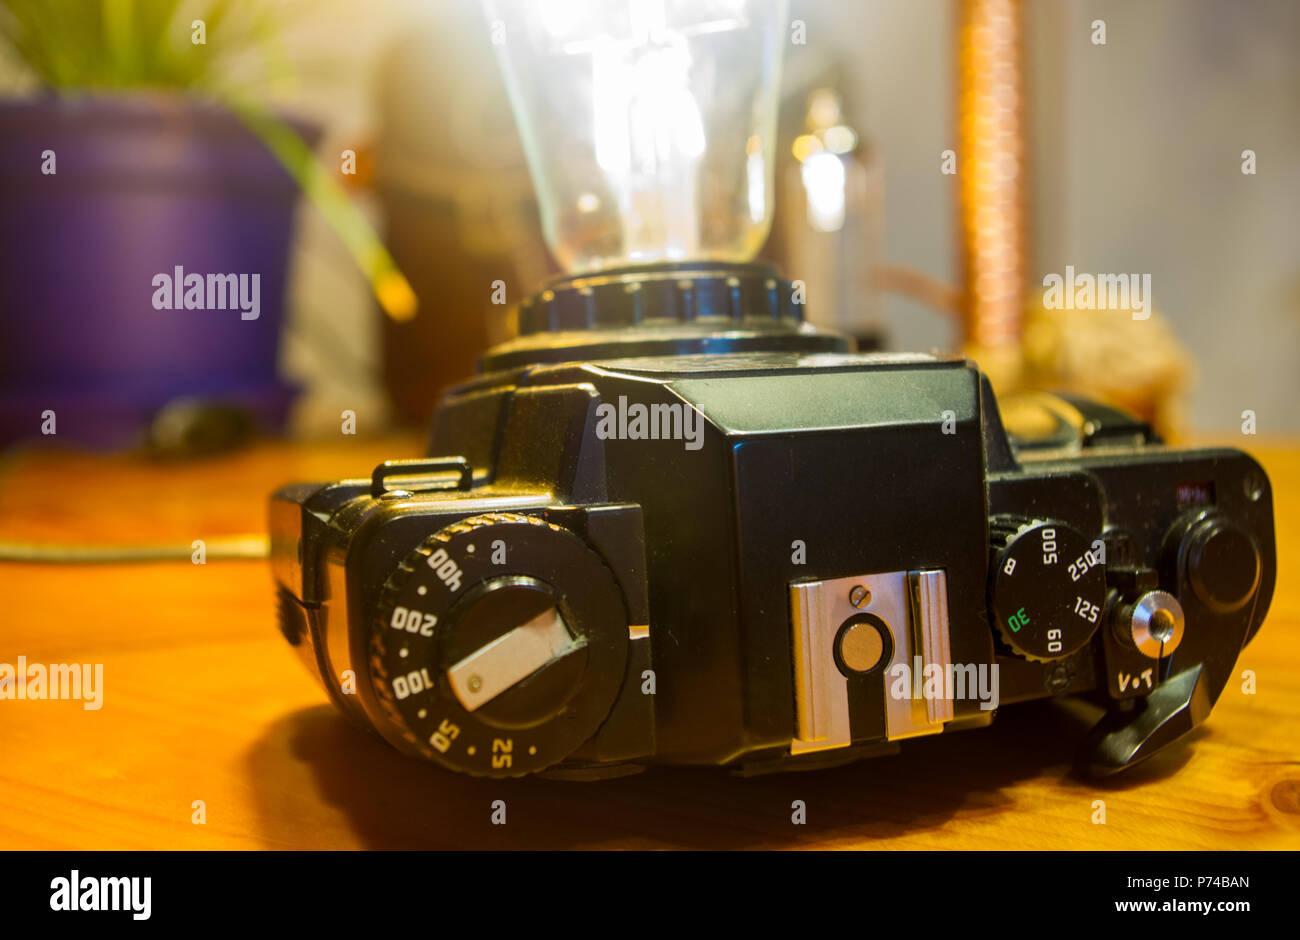 Retro Lampen Led : Light fixture handmade in vintage style retro film slr camera case